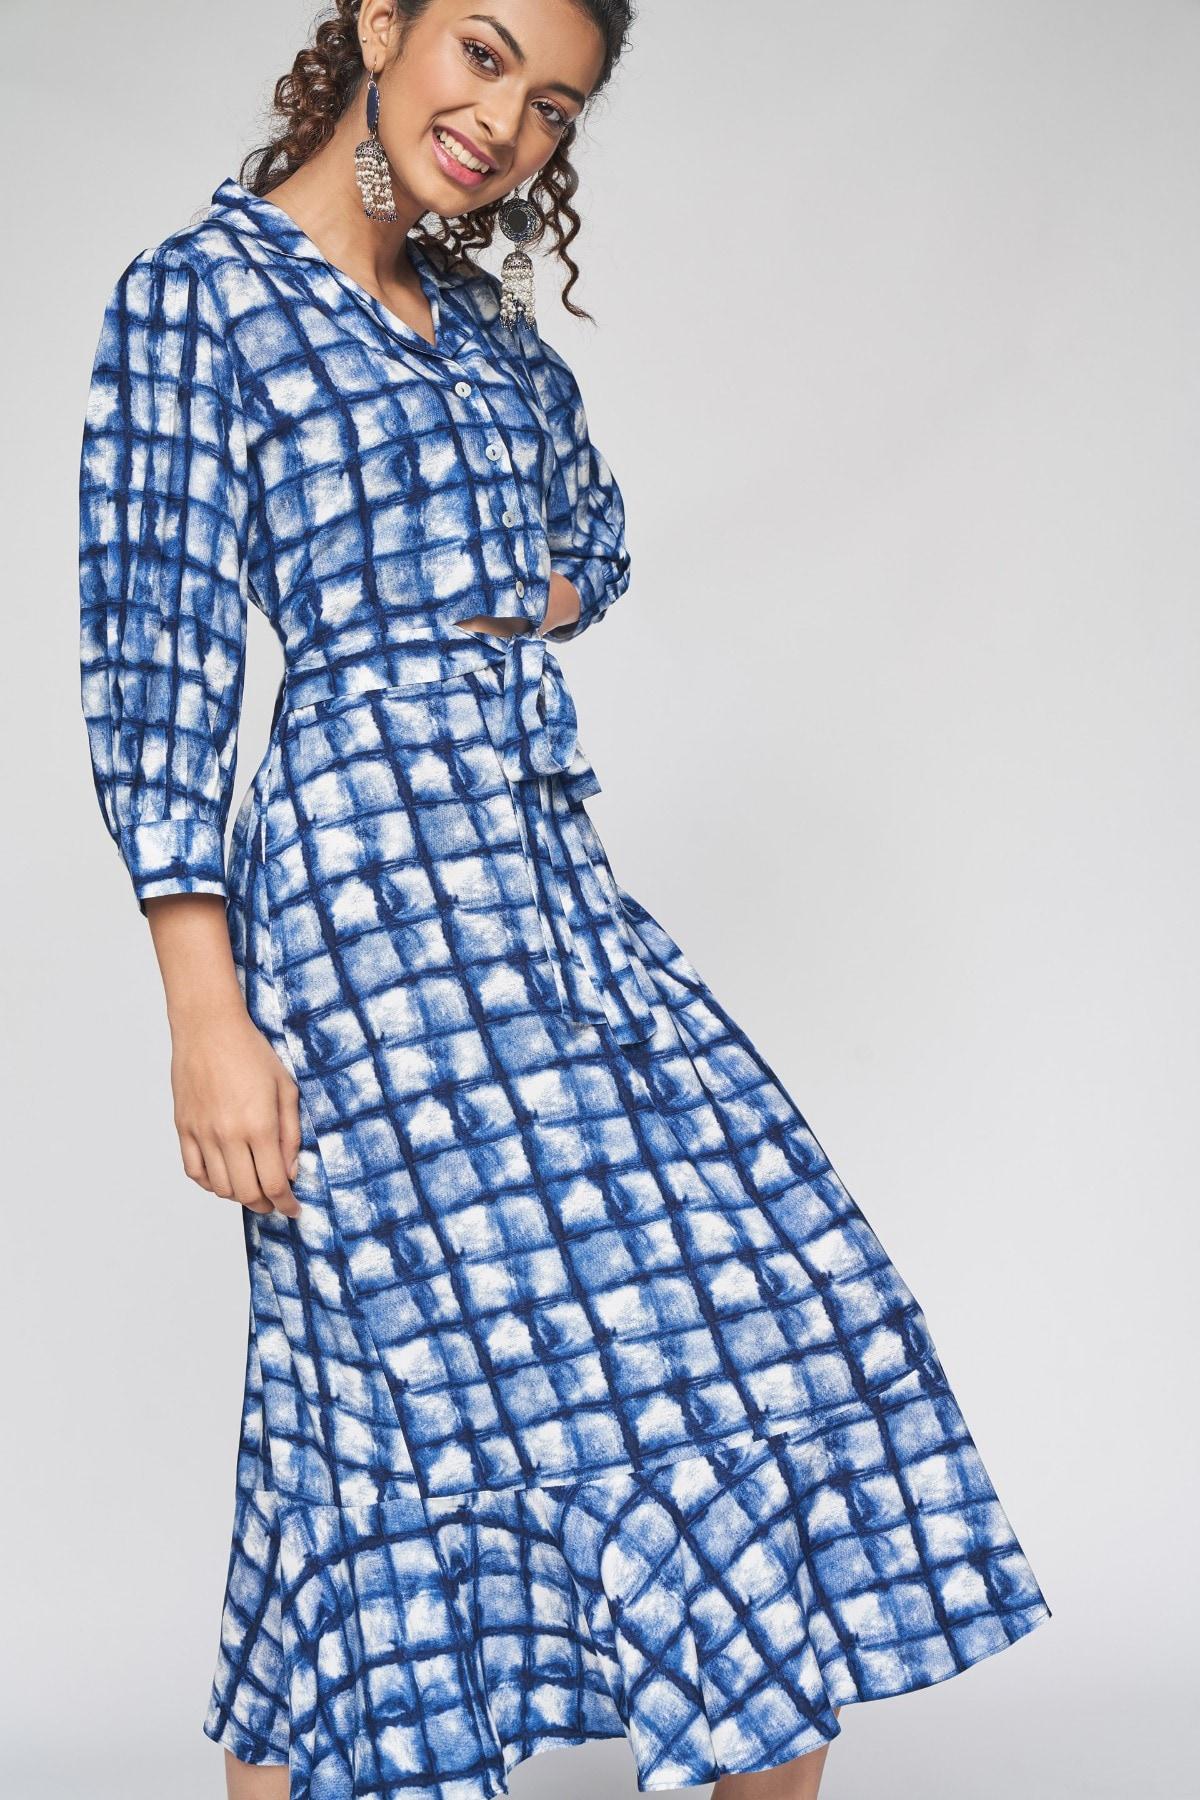 Global Desi   Indigo Tie-Ups  Printed Fit and Flare Dress